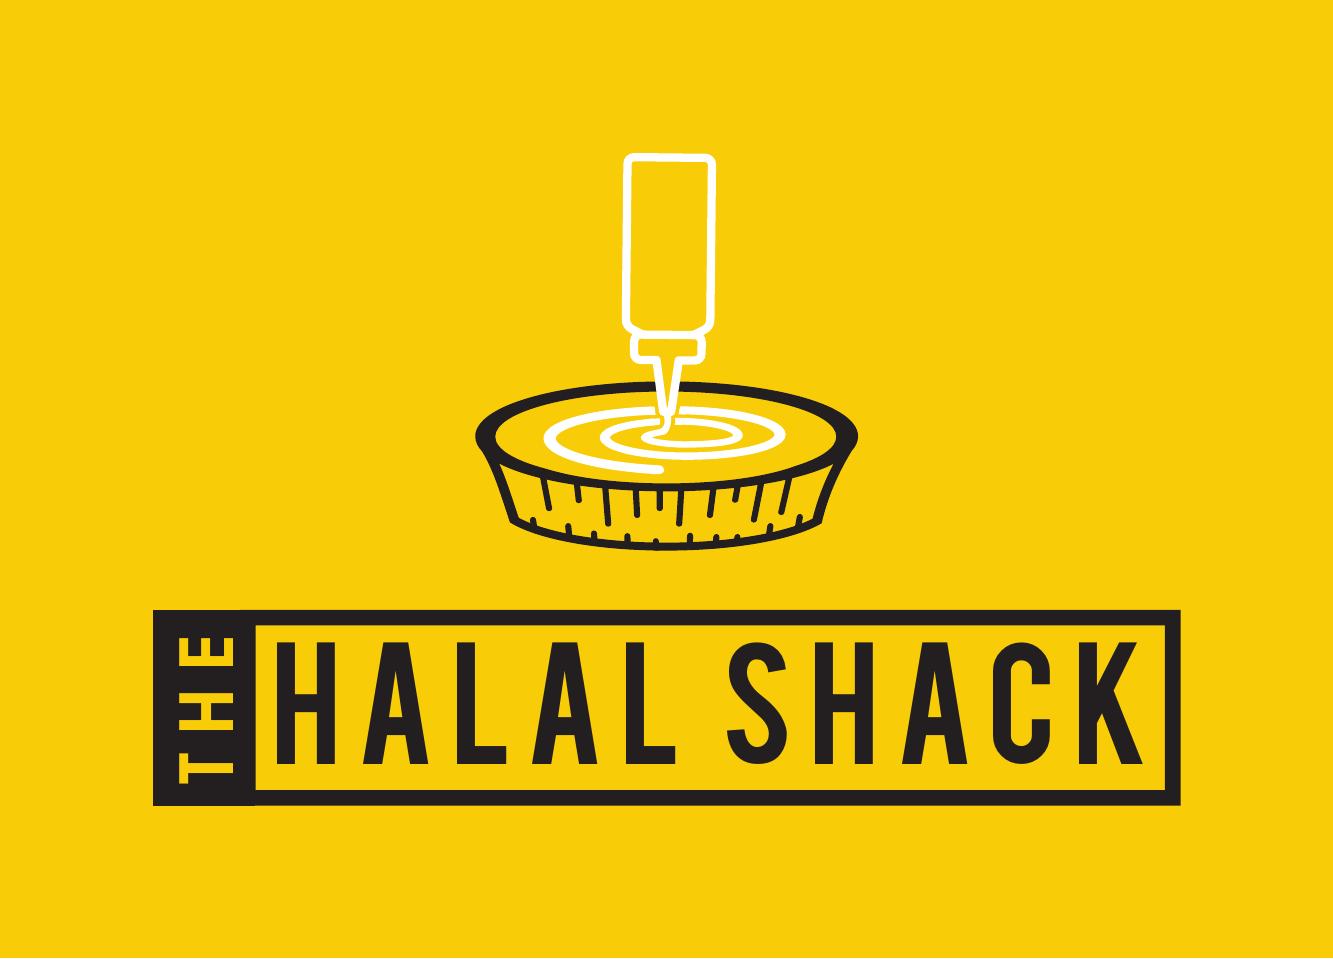 The Halal shack (1).png